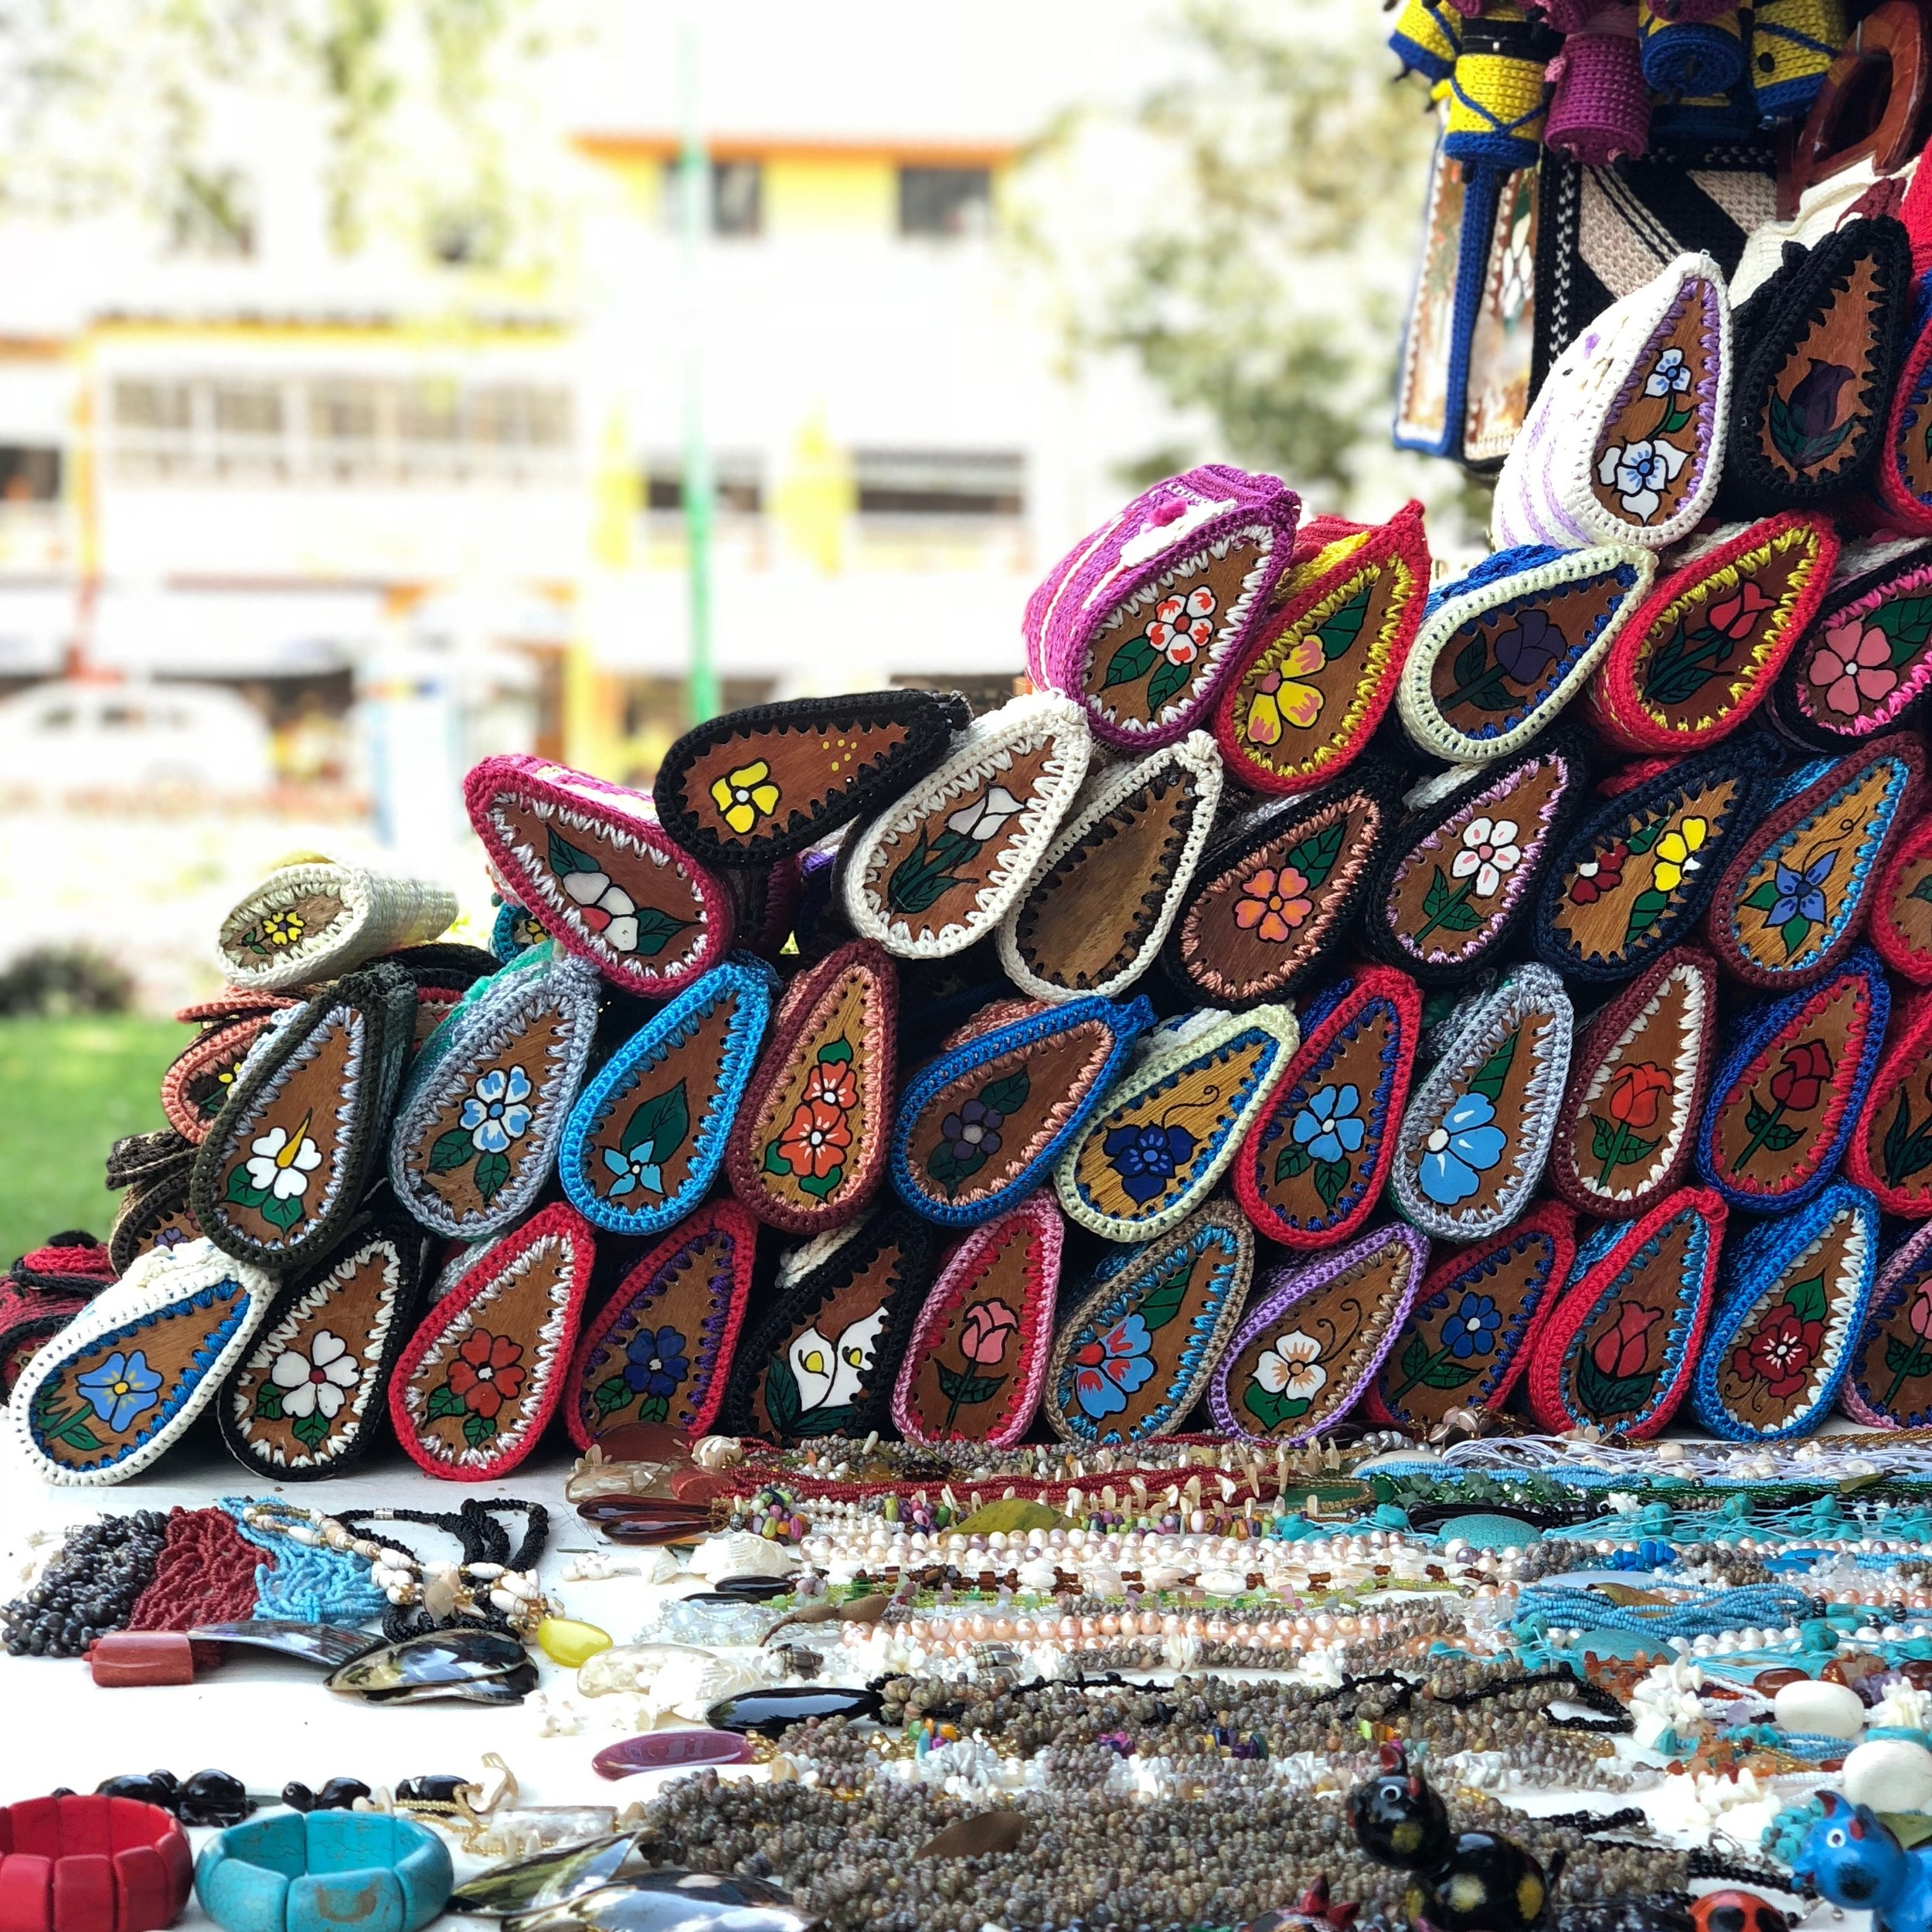 Local handicrafts in downtown La Crucecita